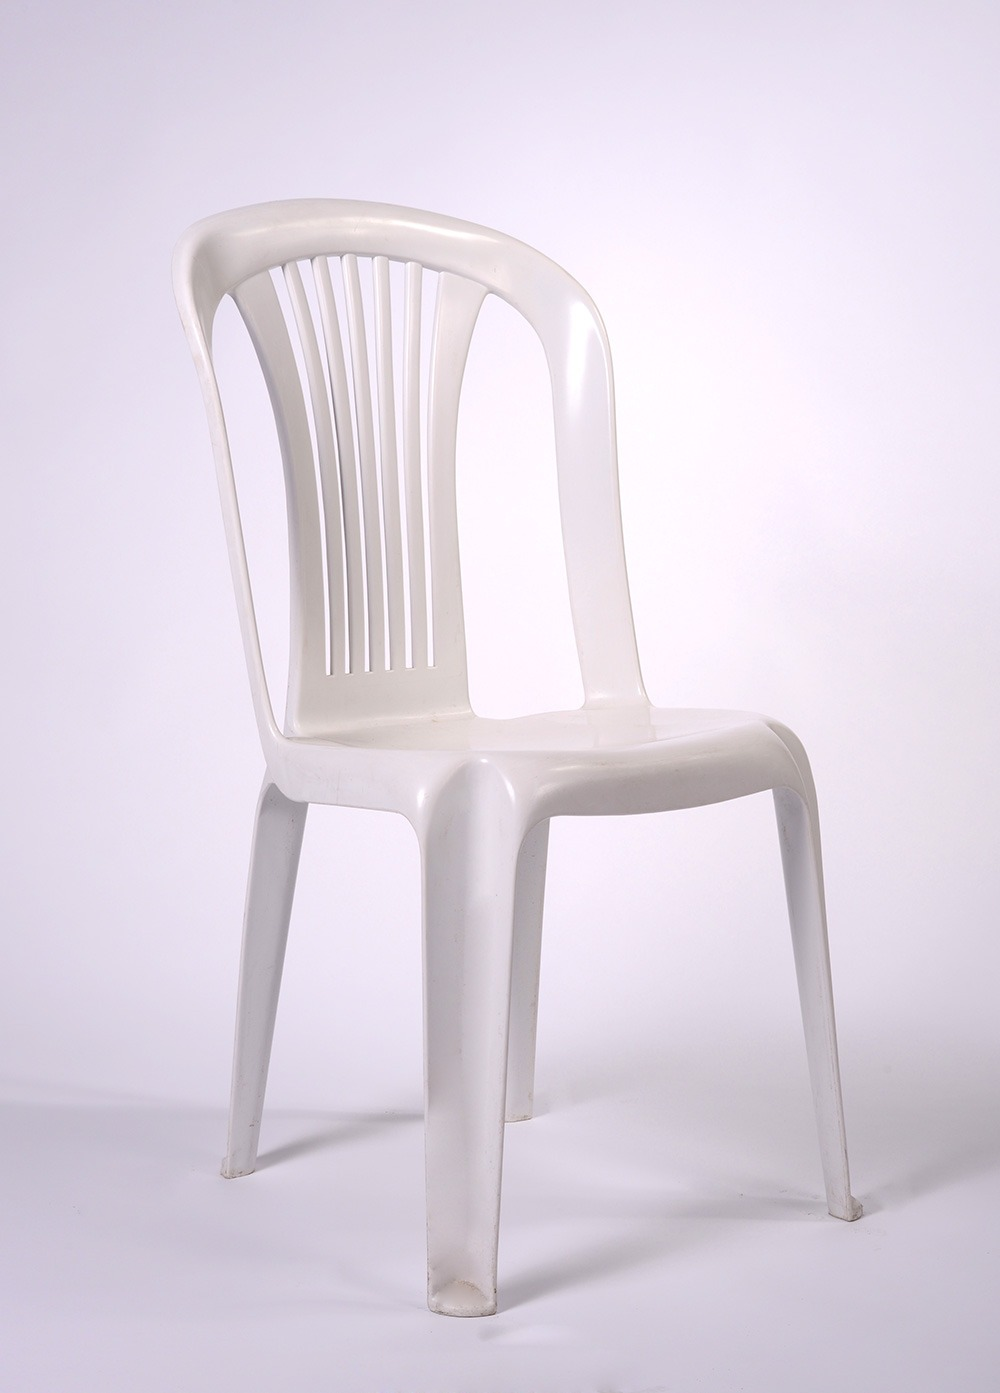 Chaise en resine chaise en rsine blanche with chaise en - Chaise resine blanche ...